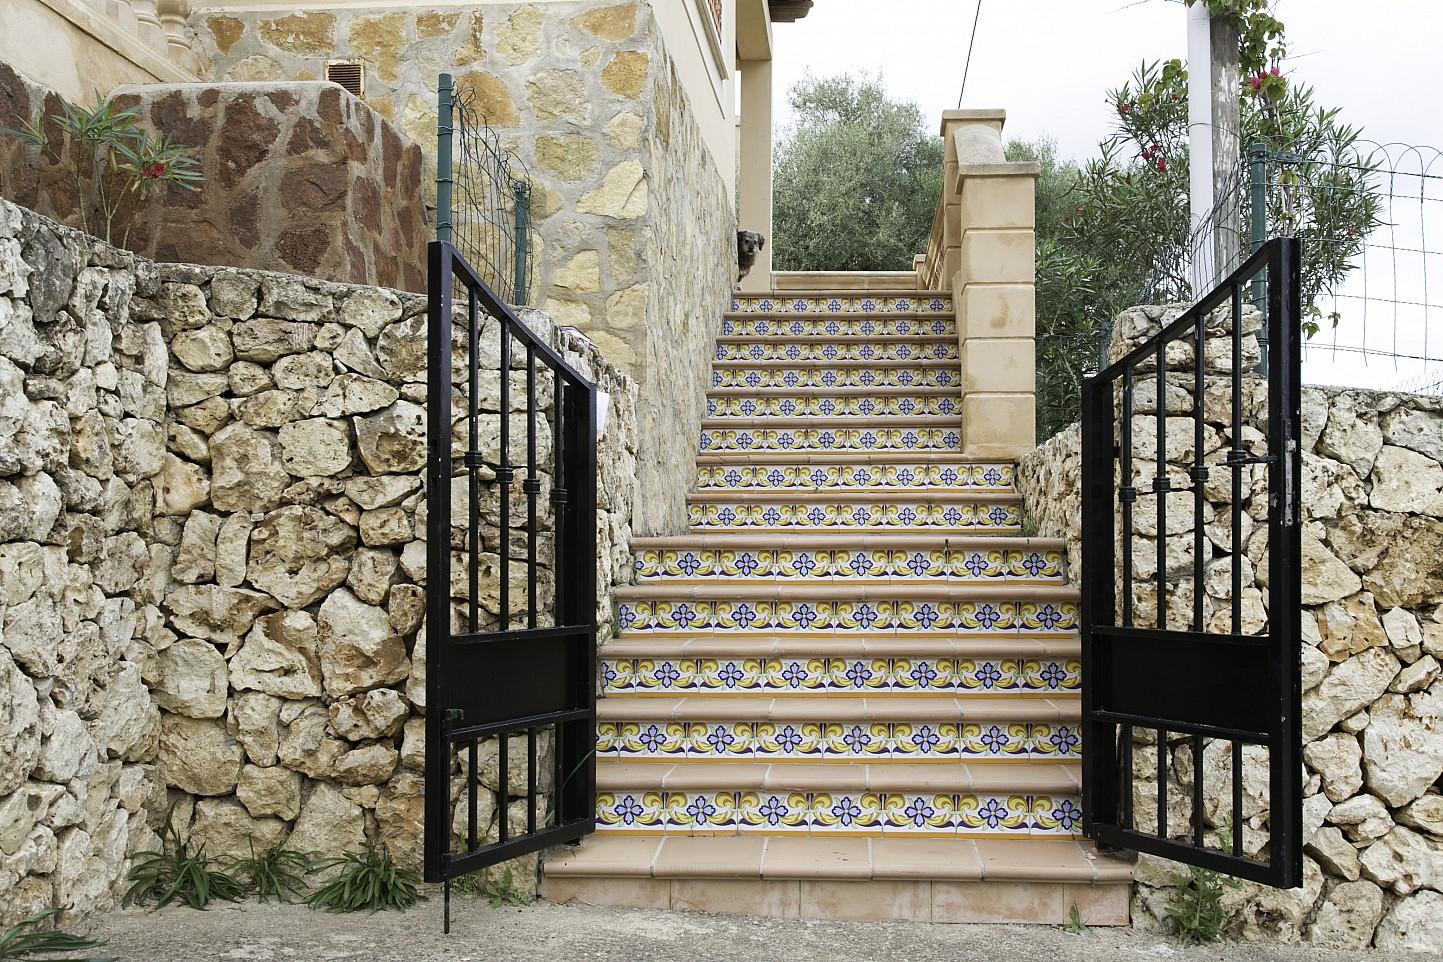 Treppen eines Hauses zum Verkauf in Villas de Cala Romántica, Mallorca